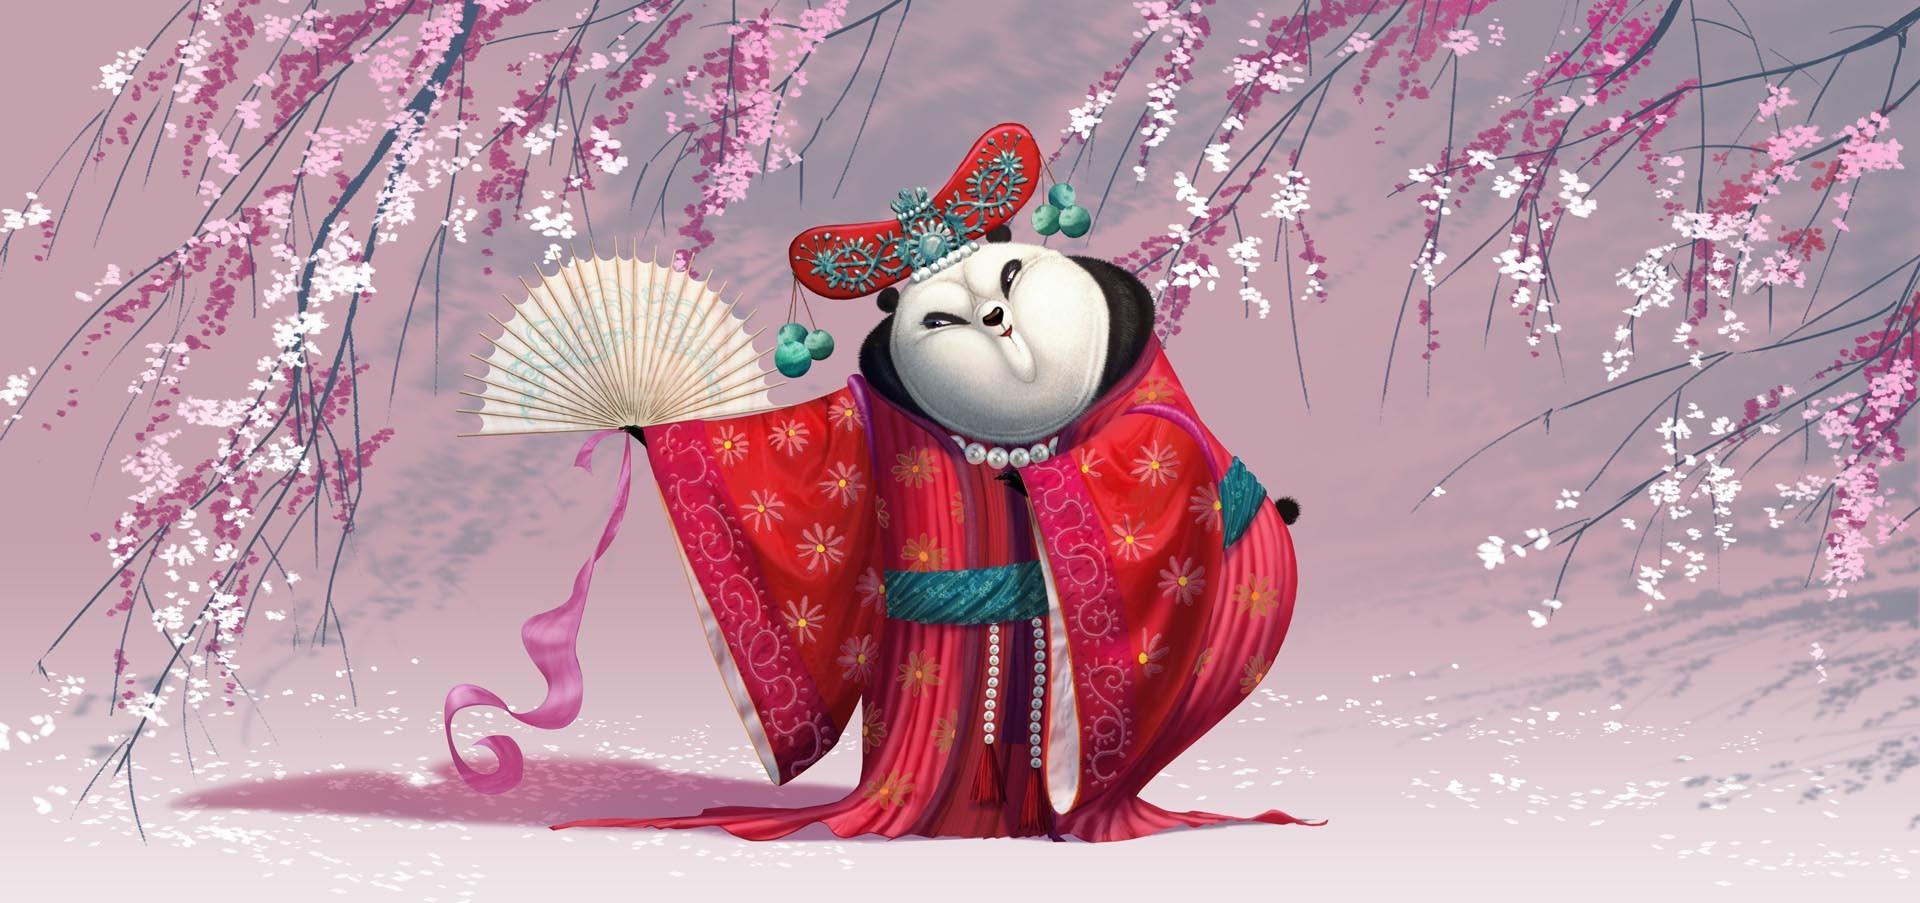 Mei Mei: concept art for Kung Fu Panda 3 by Raymond Zibach.